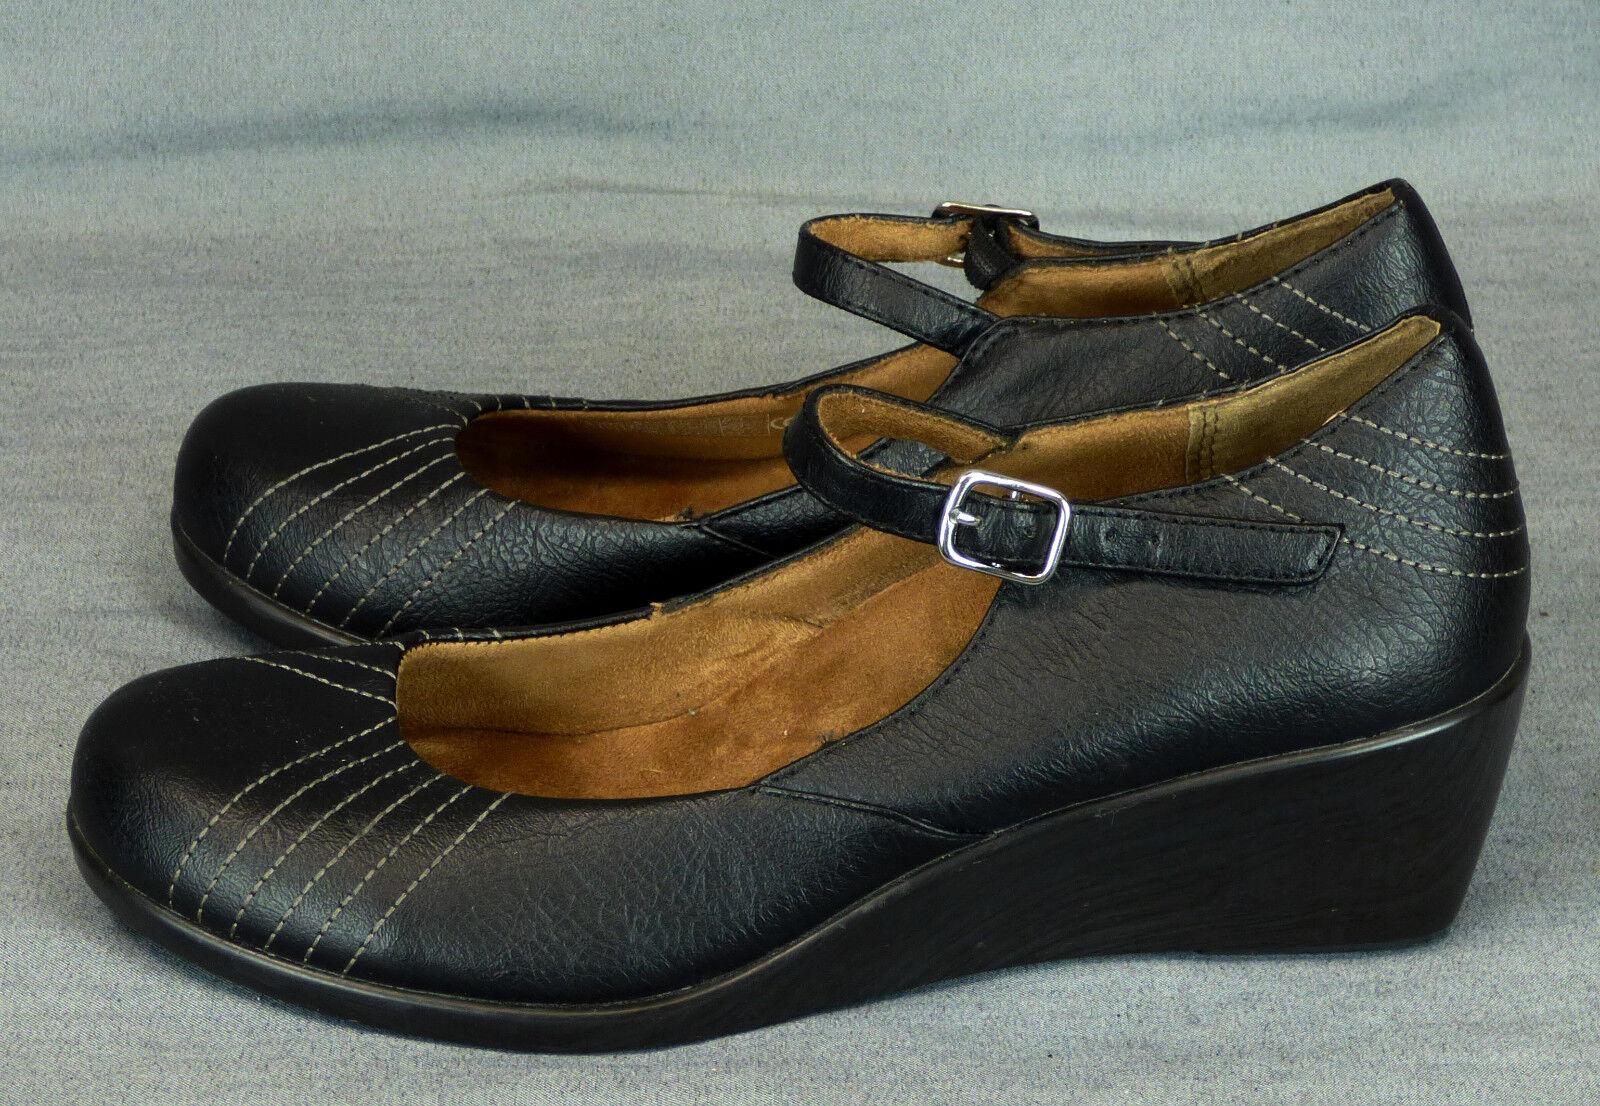 285 Vionic women heels wedge Mary Janes shoes black leather EUC 7.5